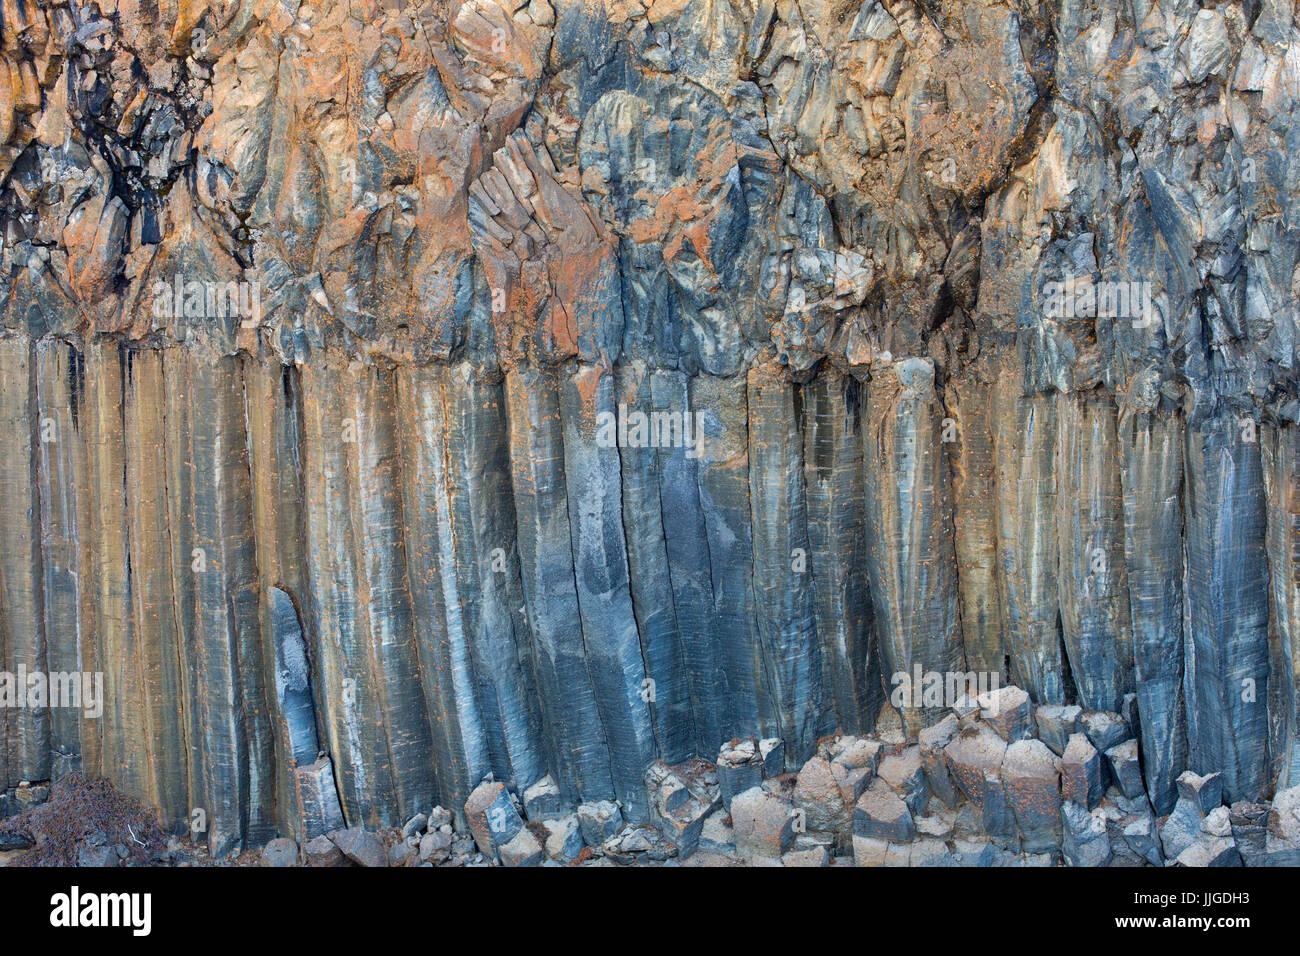 Basalt columns, volcanic lava formations in cliff along the Skjálfandafljót River, Nordurland eystra, - Stock Image